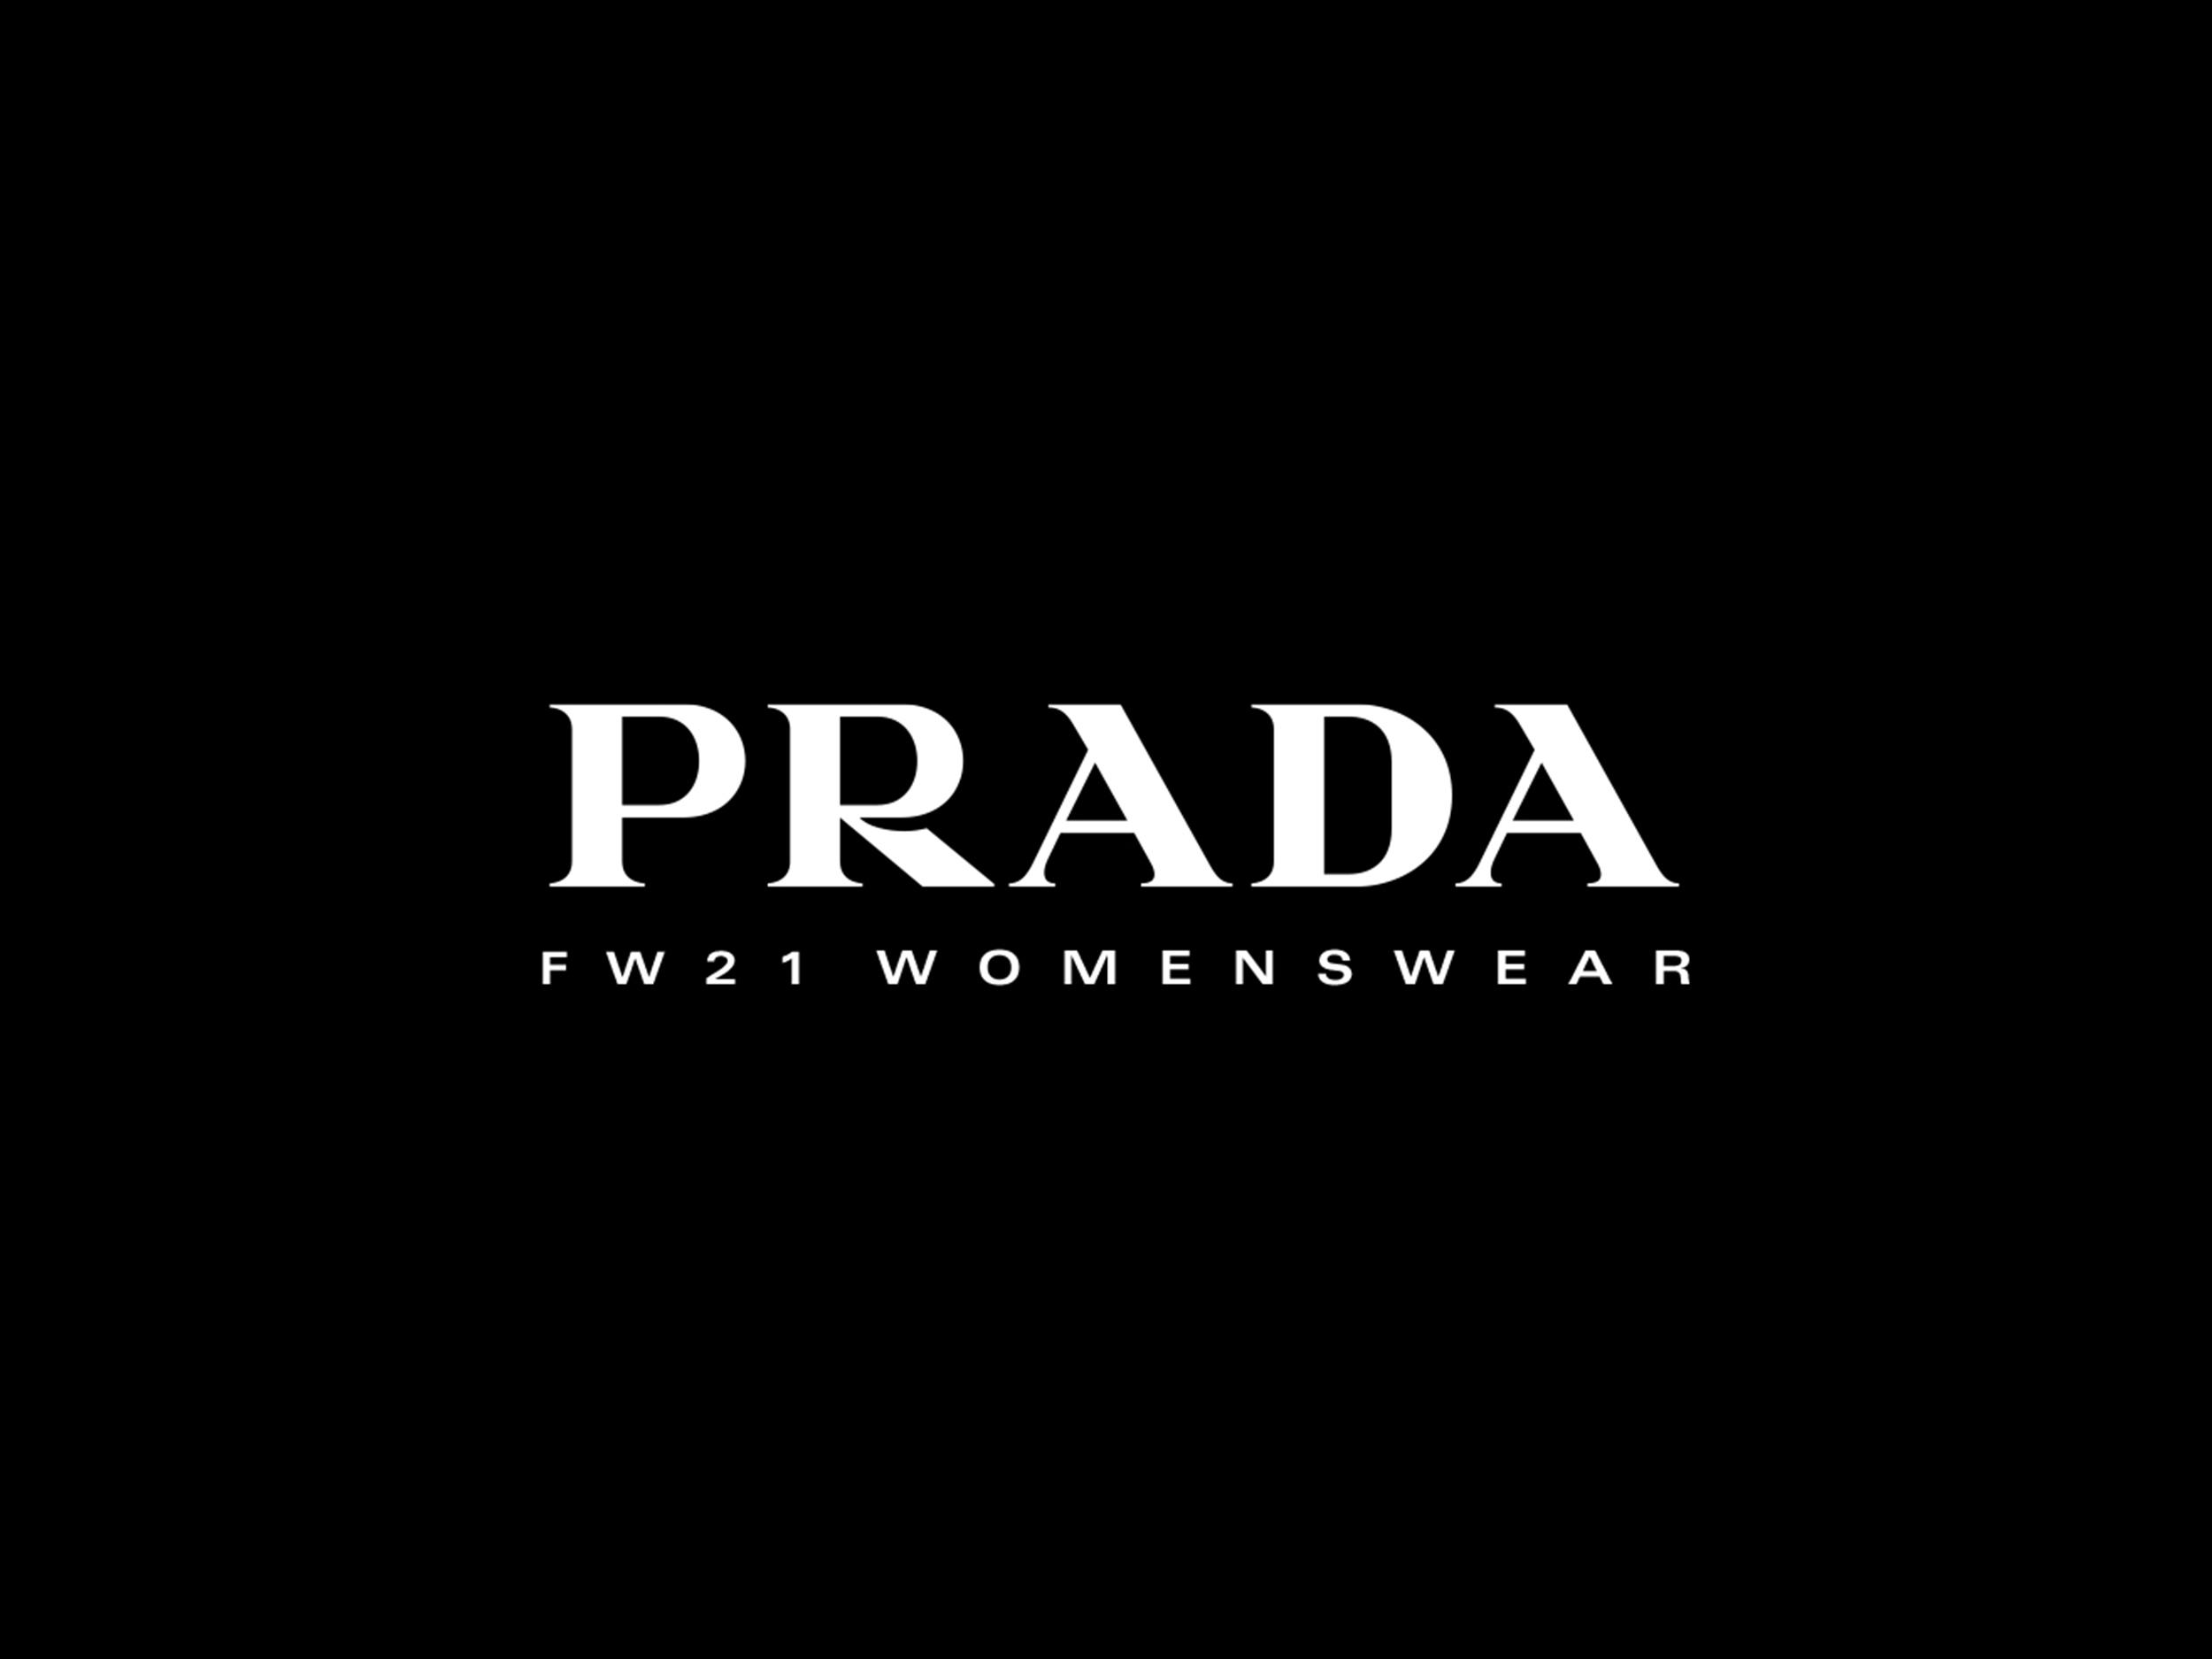 Livestream Prada's Womenswear Fall/Winter 2021 collection here